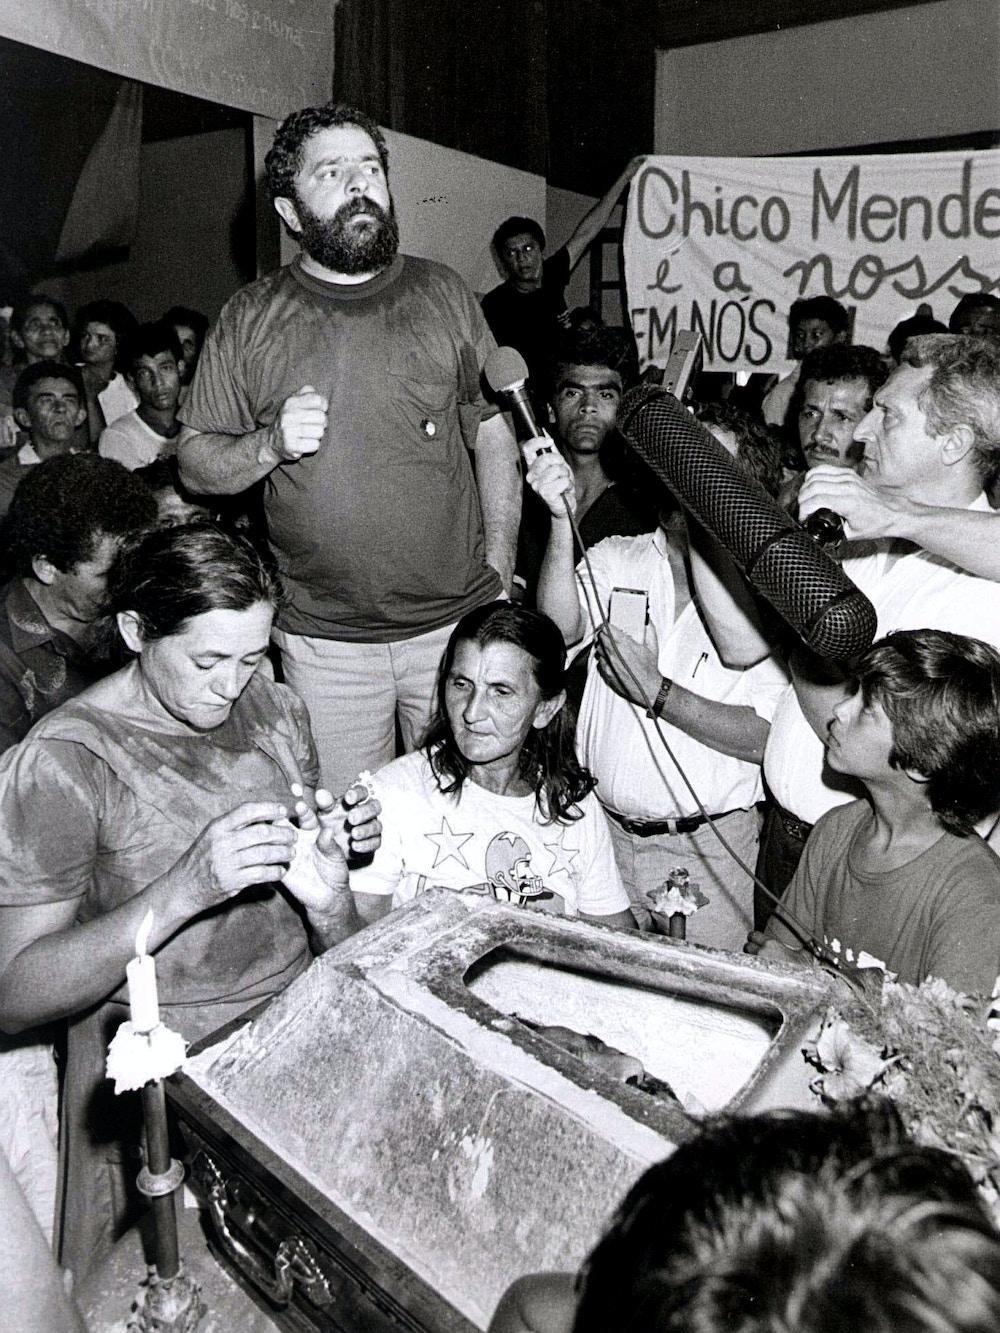 Lula discursa em funeral de Chico Mendes, no dia 25 de dezembro de 1988.